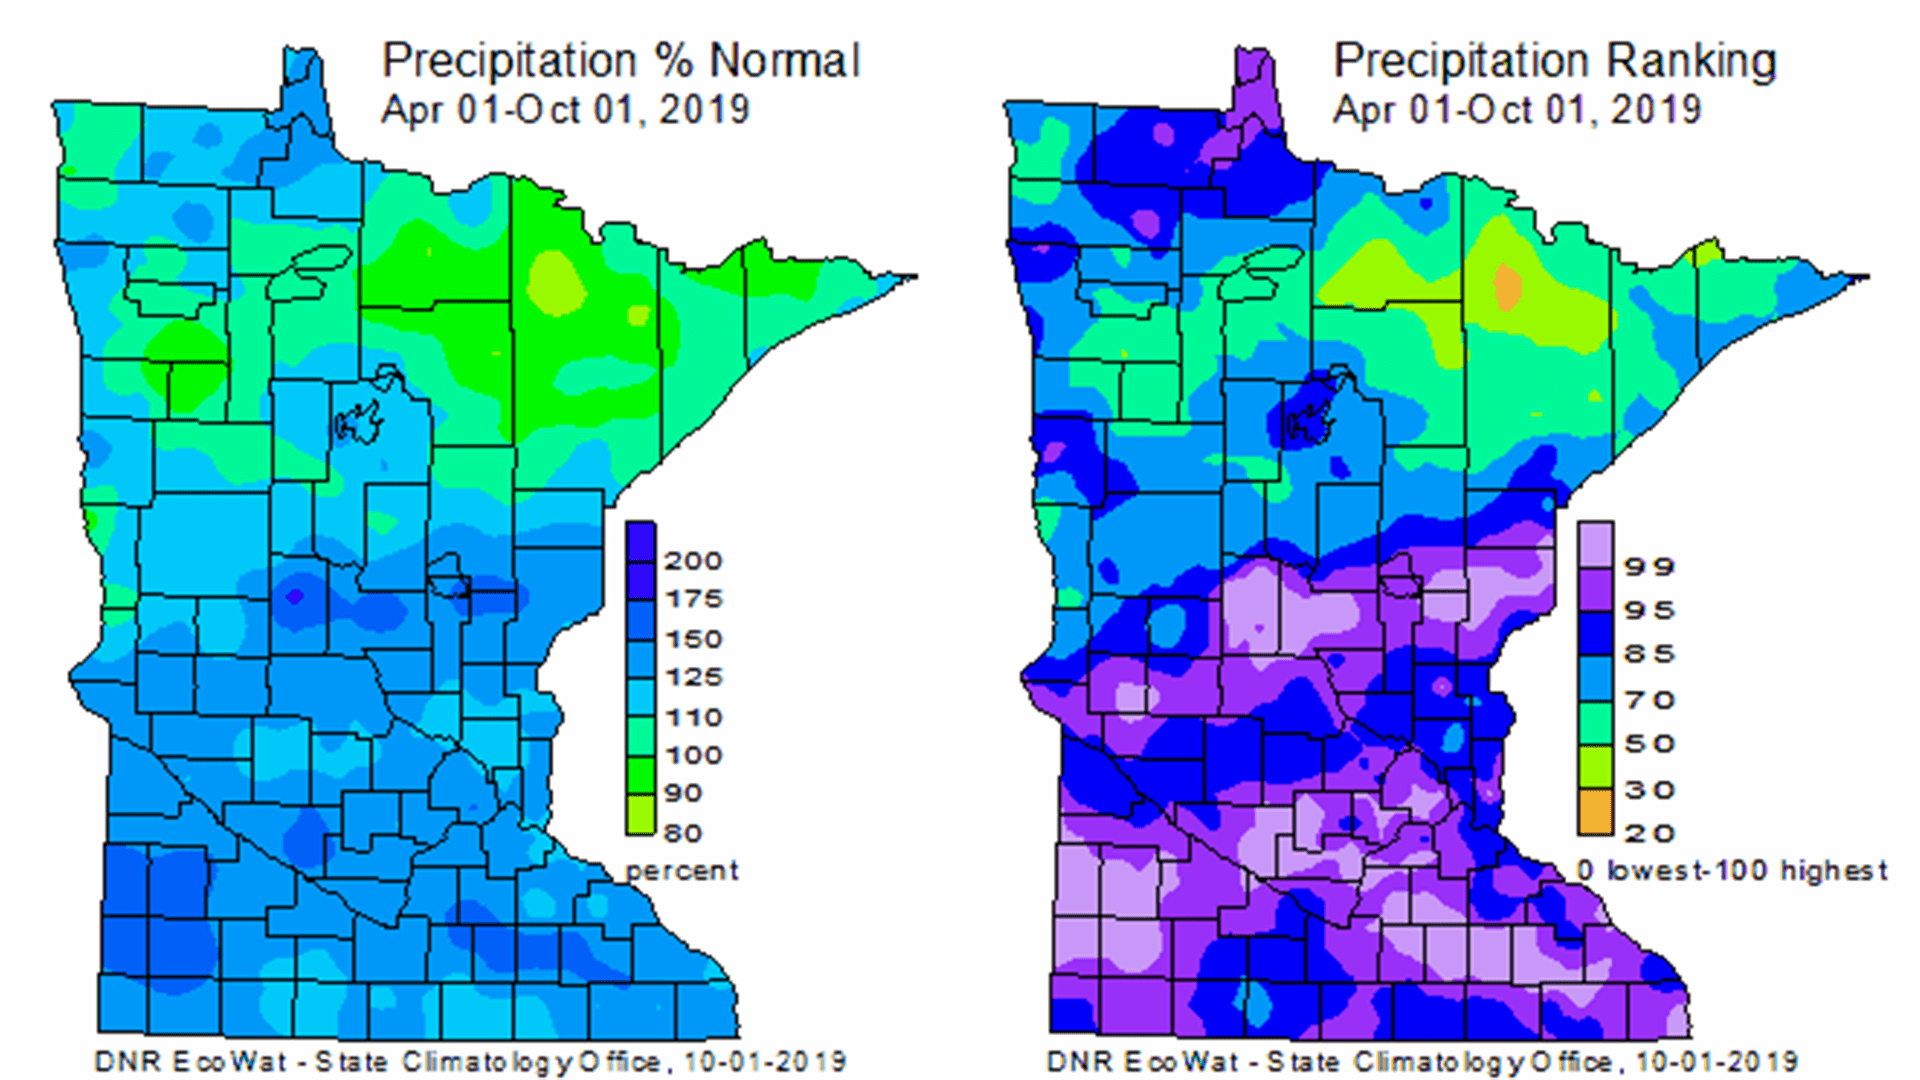 Two Minnesota precipitation maps